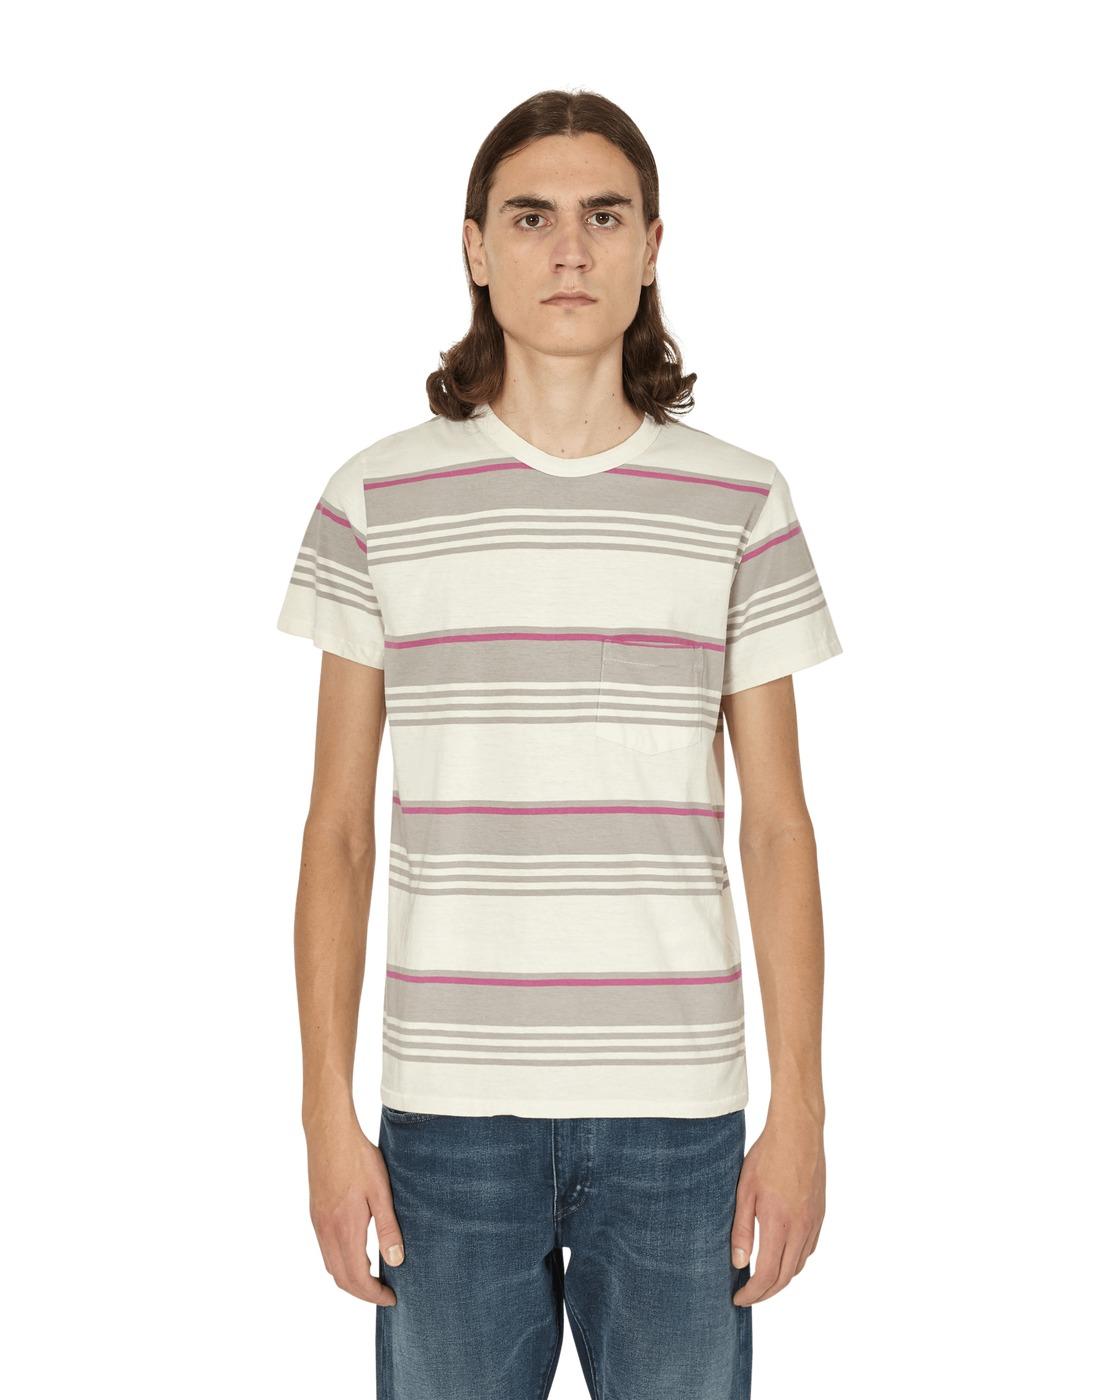 Photo: Levi's Vintage 1960's Causal Stripe T Shirt Grey Multi